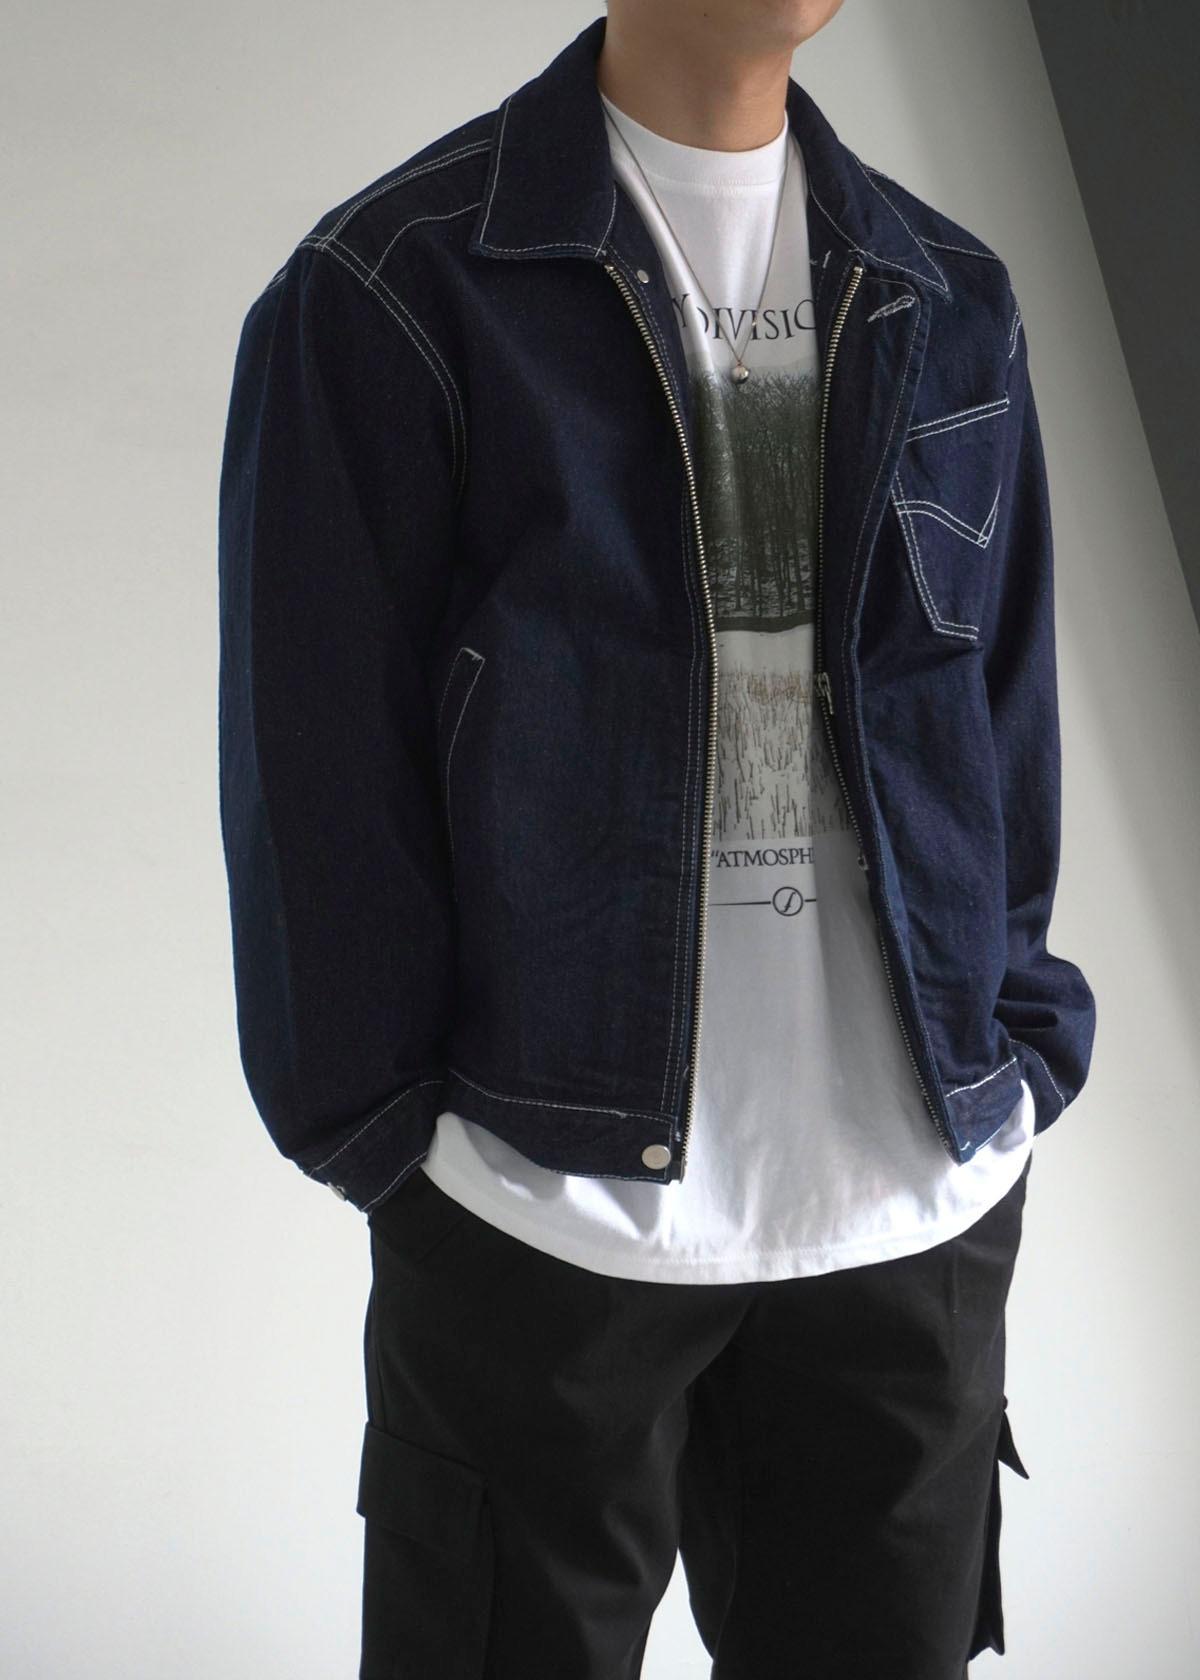 Stitch Deepblue Denim Trucker Jacket